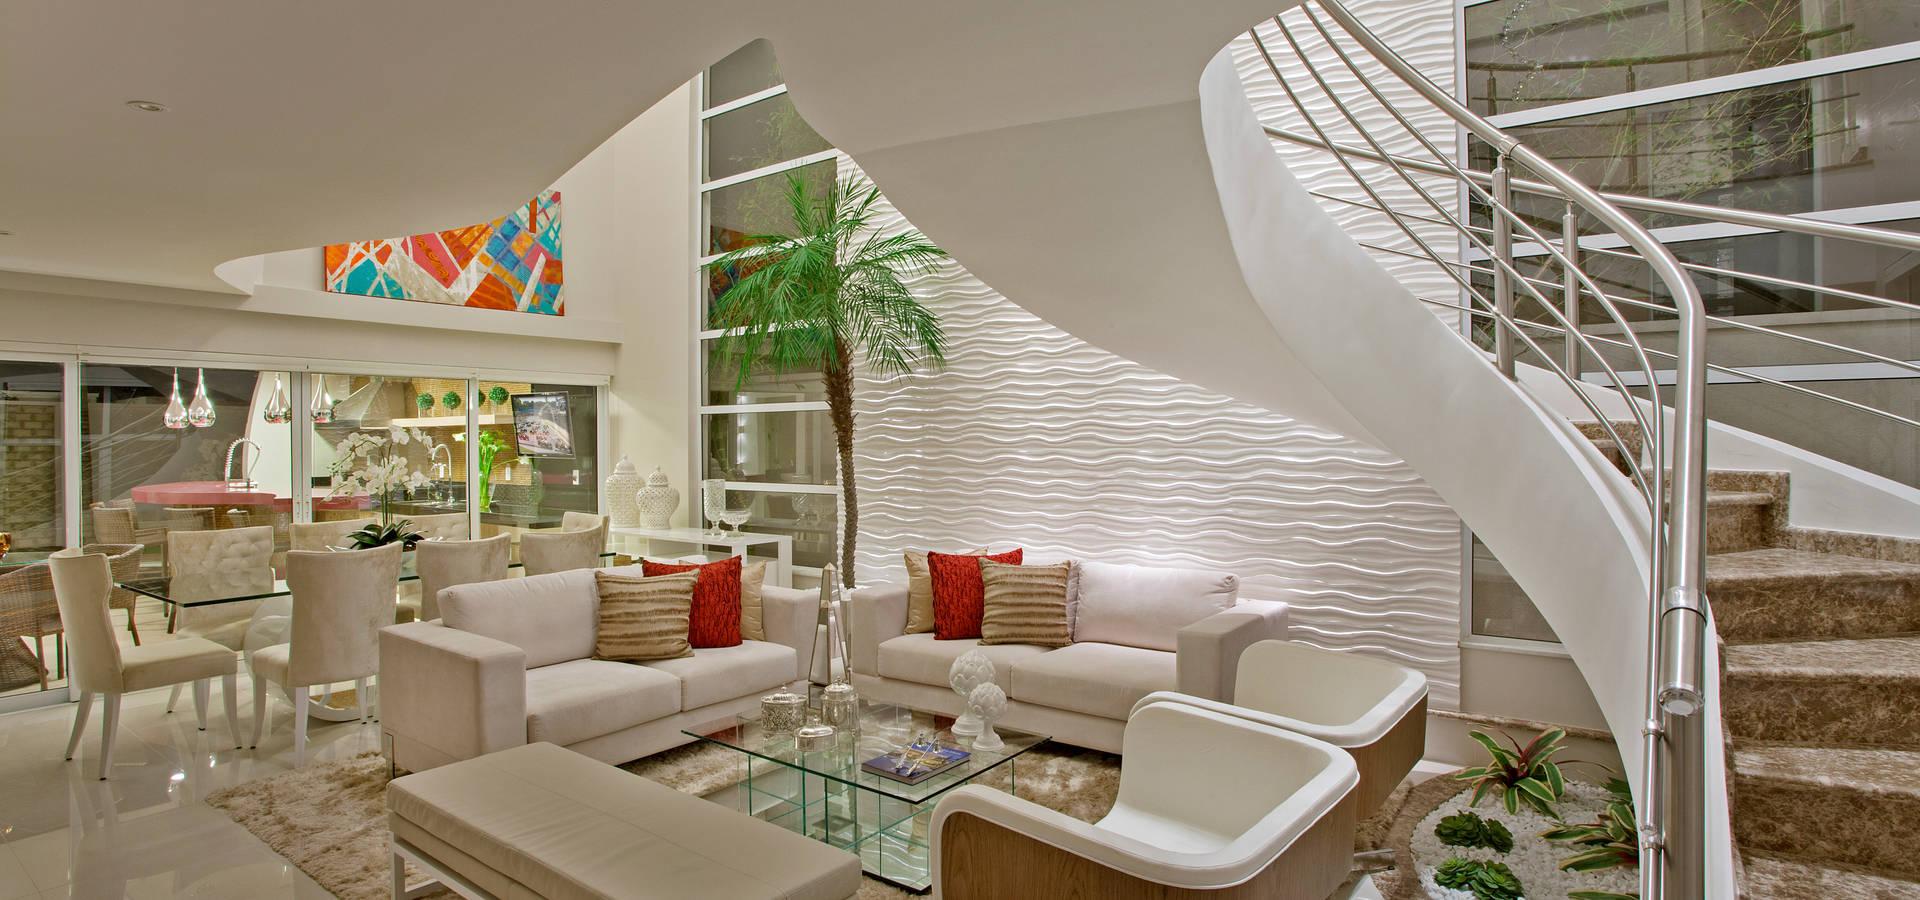 Designer de Interiores e Paisagista Iara Kílaris